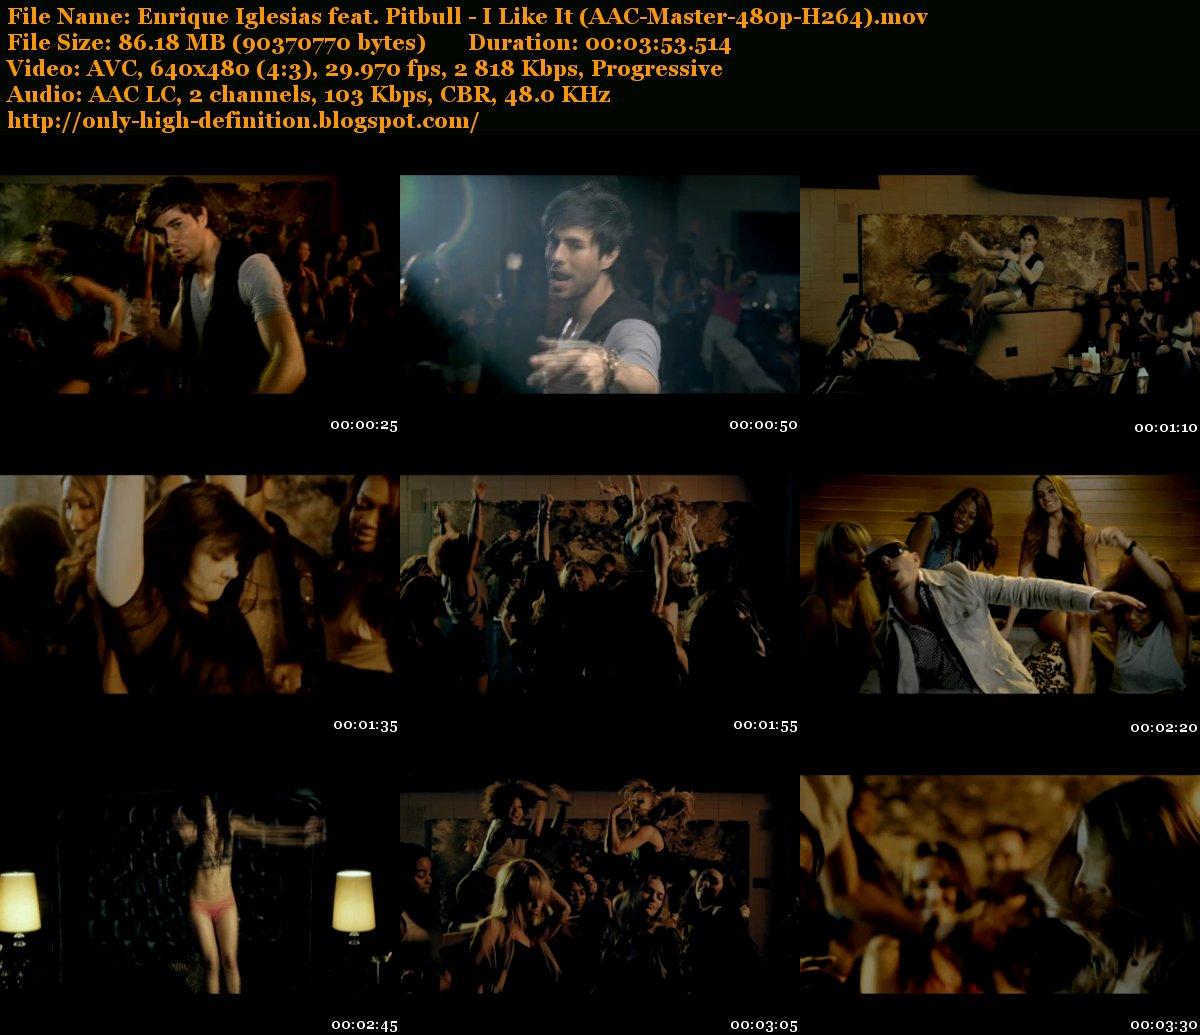 http://1.bp.blogspot.com/-zjYYQ7wbHIs/UD4oCWxX7aI/AAAAAAAAD5M/z8exenIiOpw/s1600/Enrique+Iglesias+feat.+Pitbull+-+I+Like+It+%28AAC-Master-480p-H264%29.mov_tn.jpg